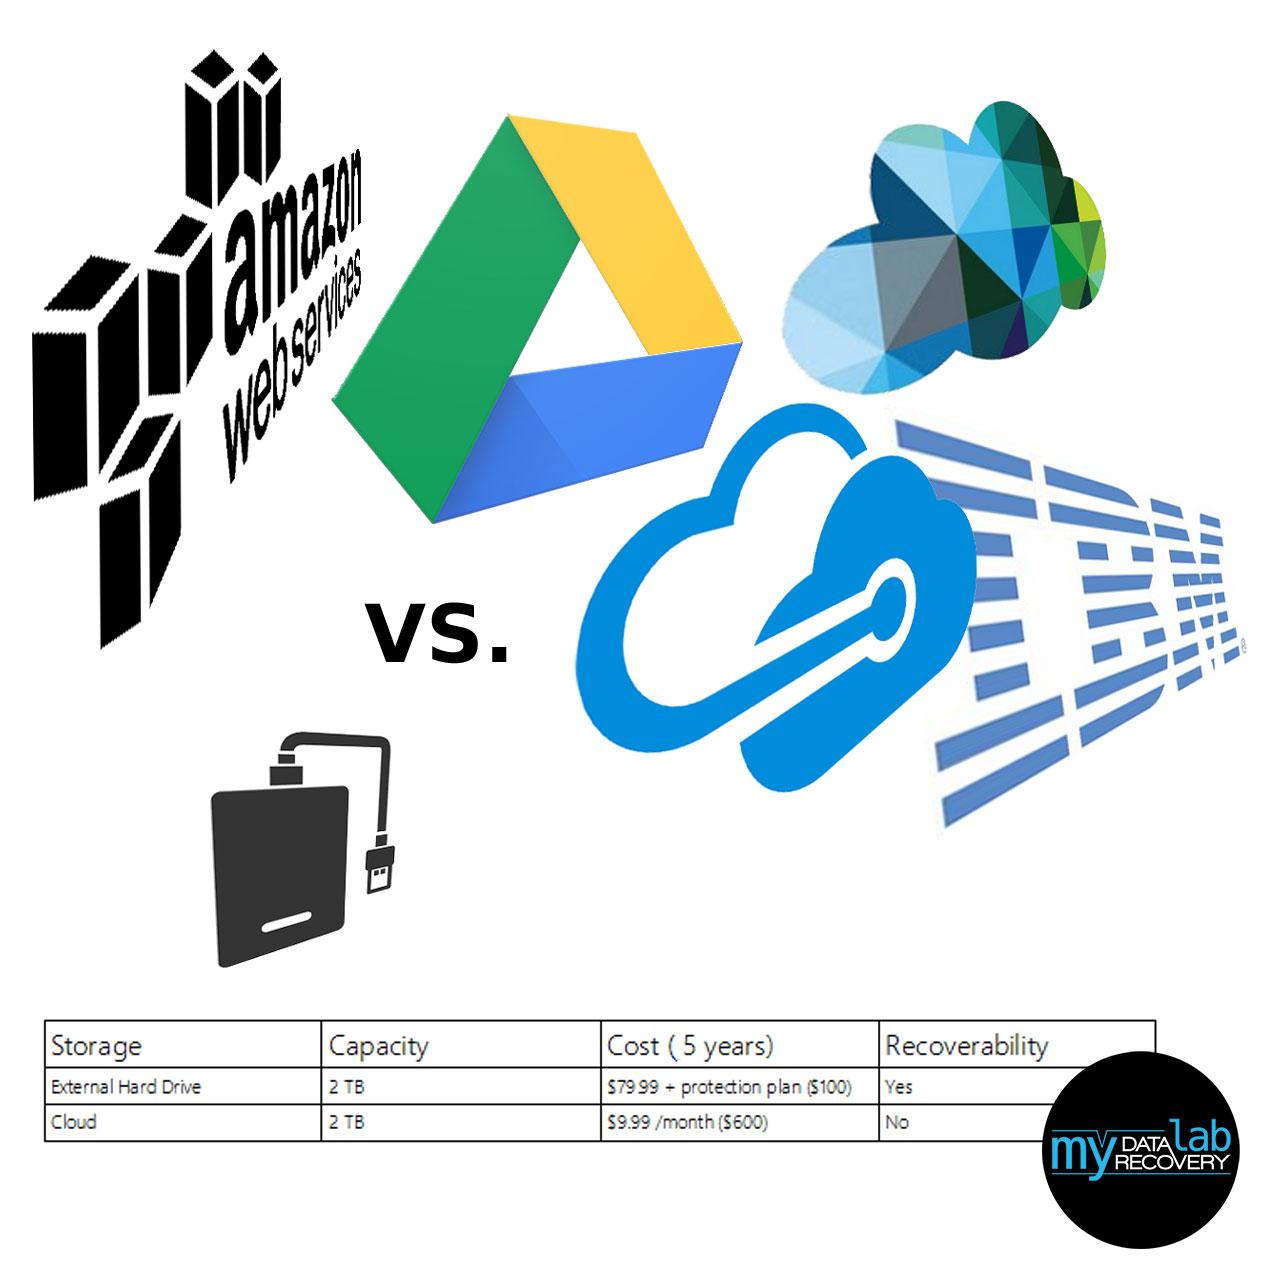 Cloud Backup vs External Drive